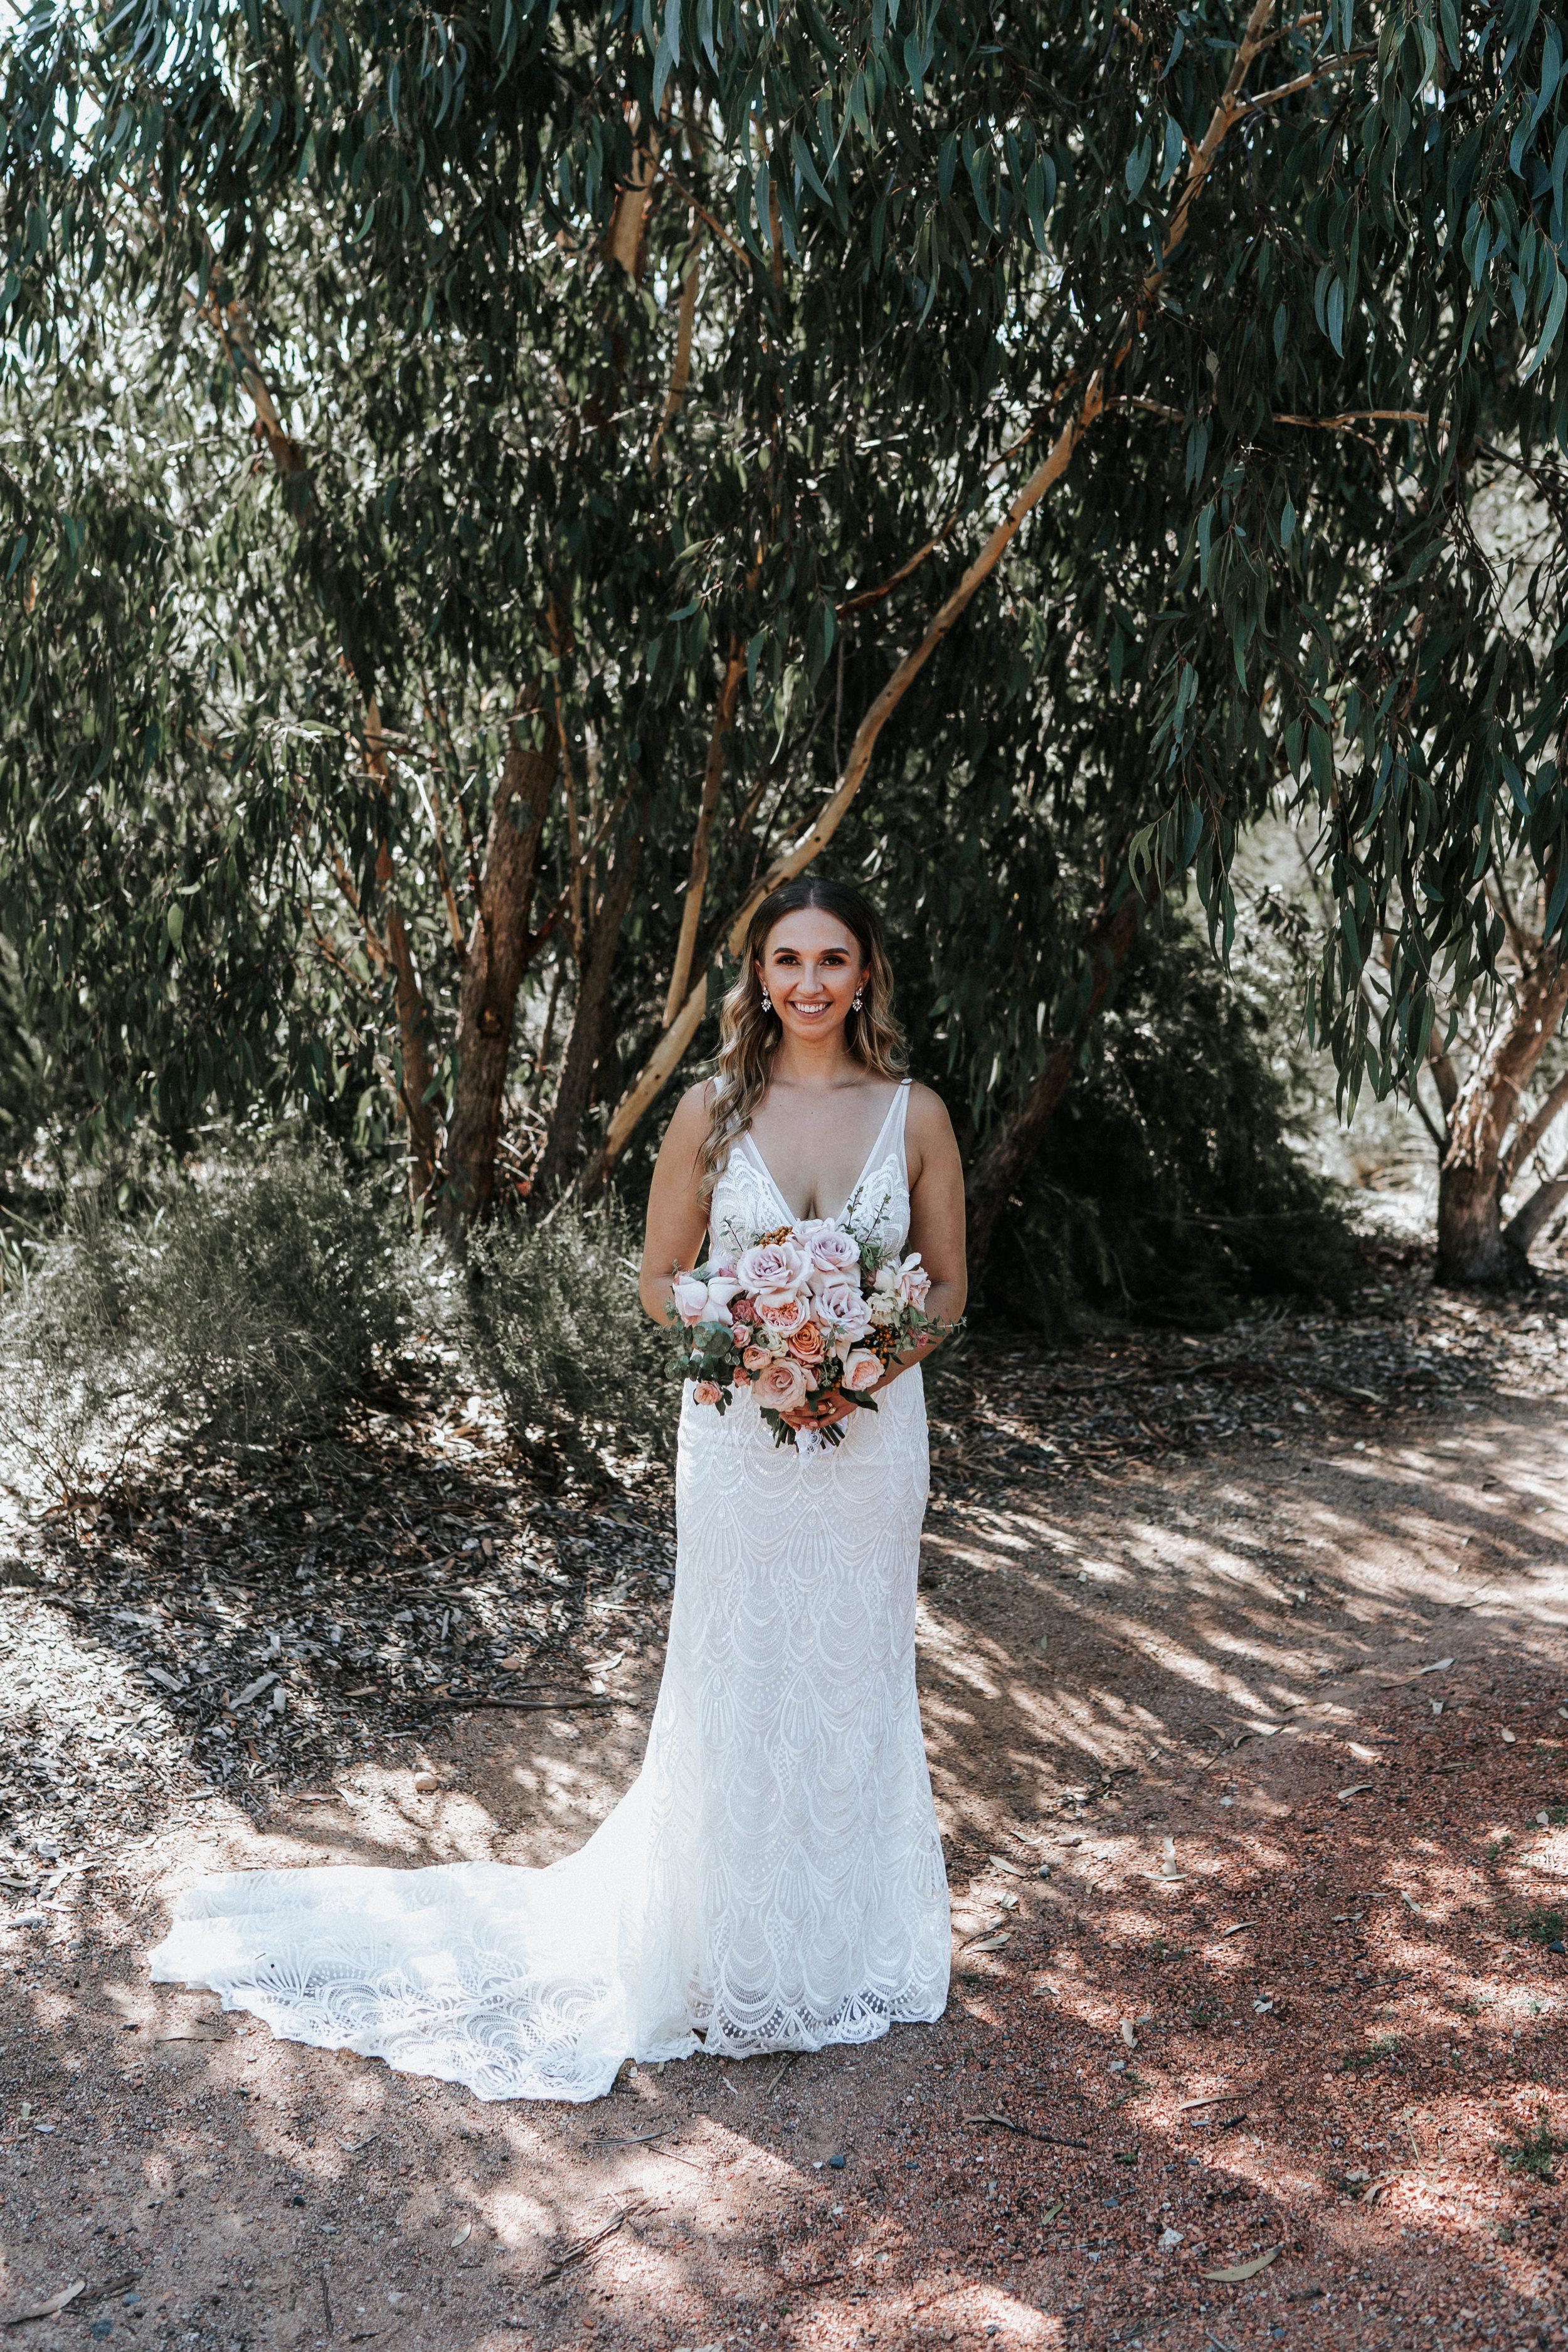 michelle-jonathon-harley-wedding-654.jpg